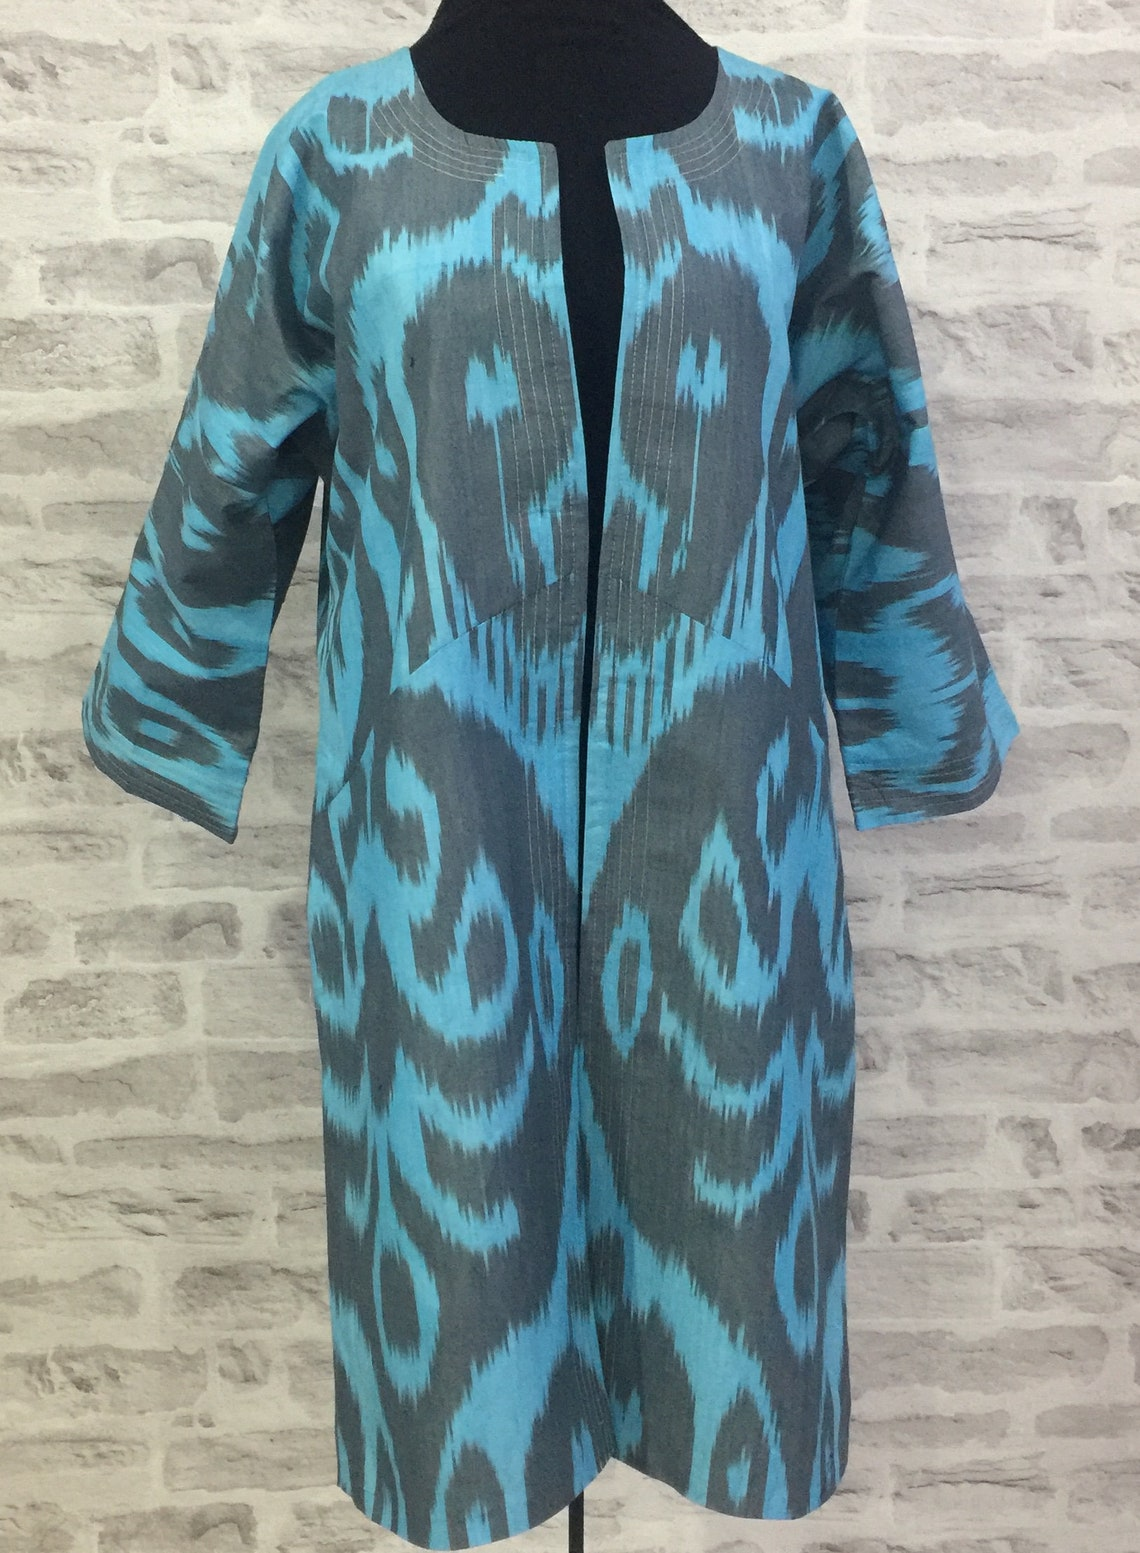 Uzbek Cotton And Silk Ikat Ethnic Coat Chapan - Boho Nomad Dress Kaftan Robe, Size Xl, Chest 106 Cm / 41.73